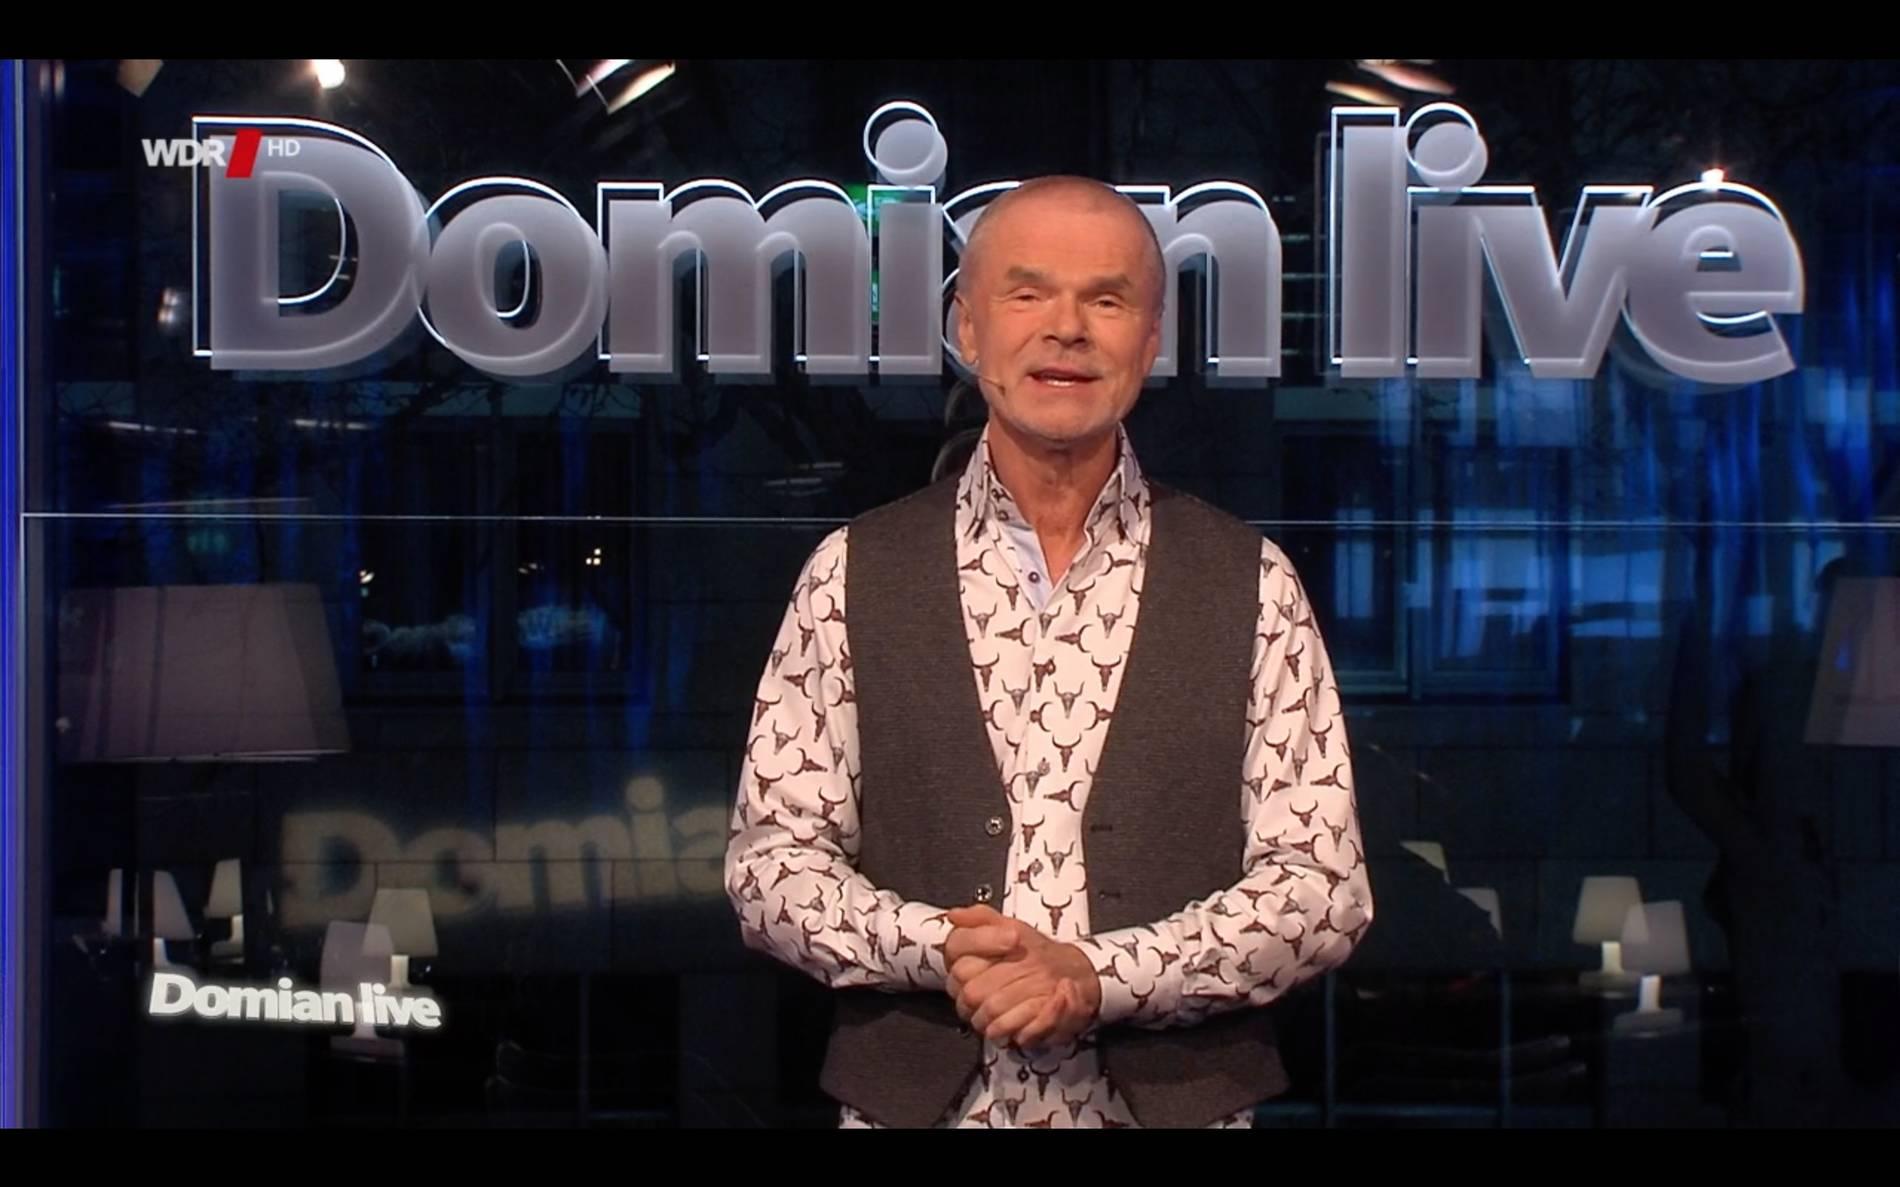 Domian 1 Live